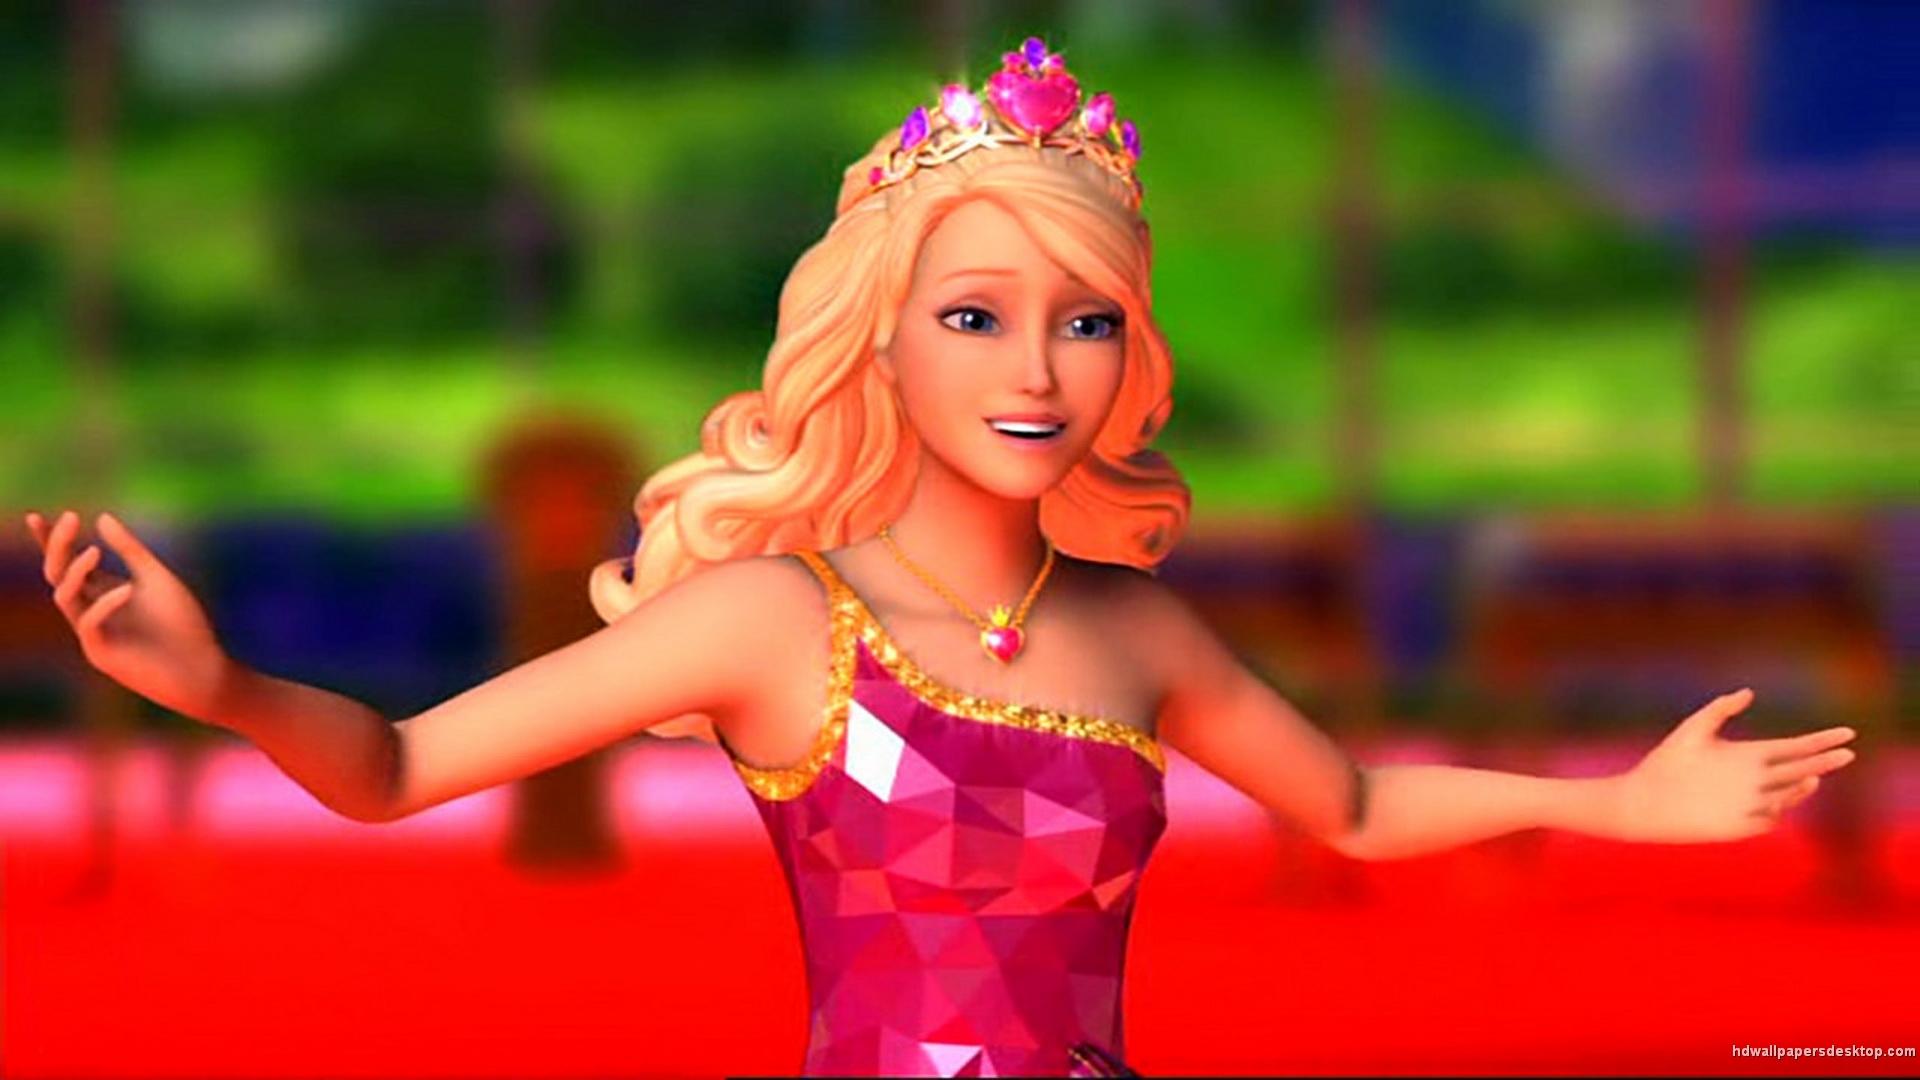 Barbie Dancing and Singing - Barbie Dancing and Singing